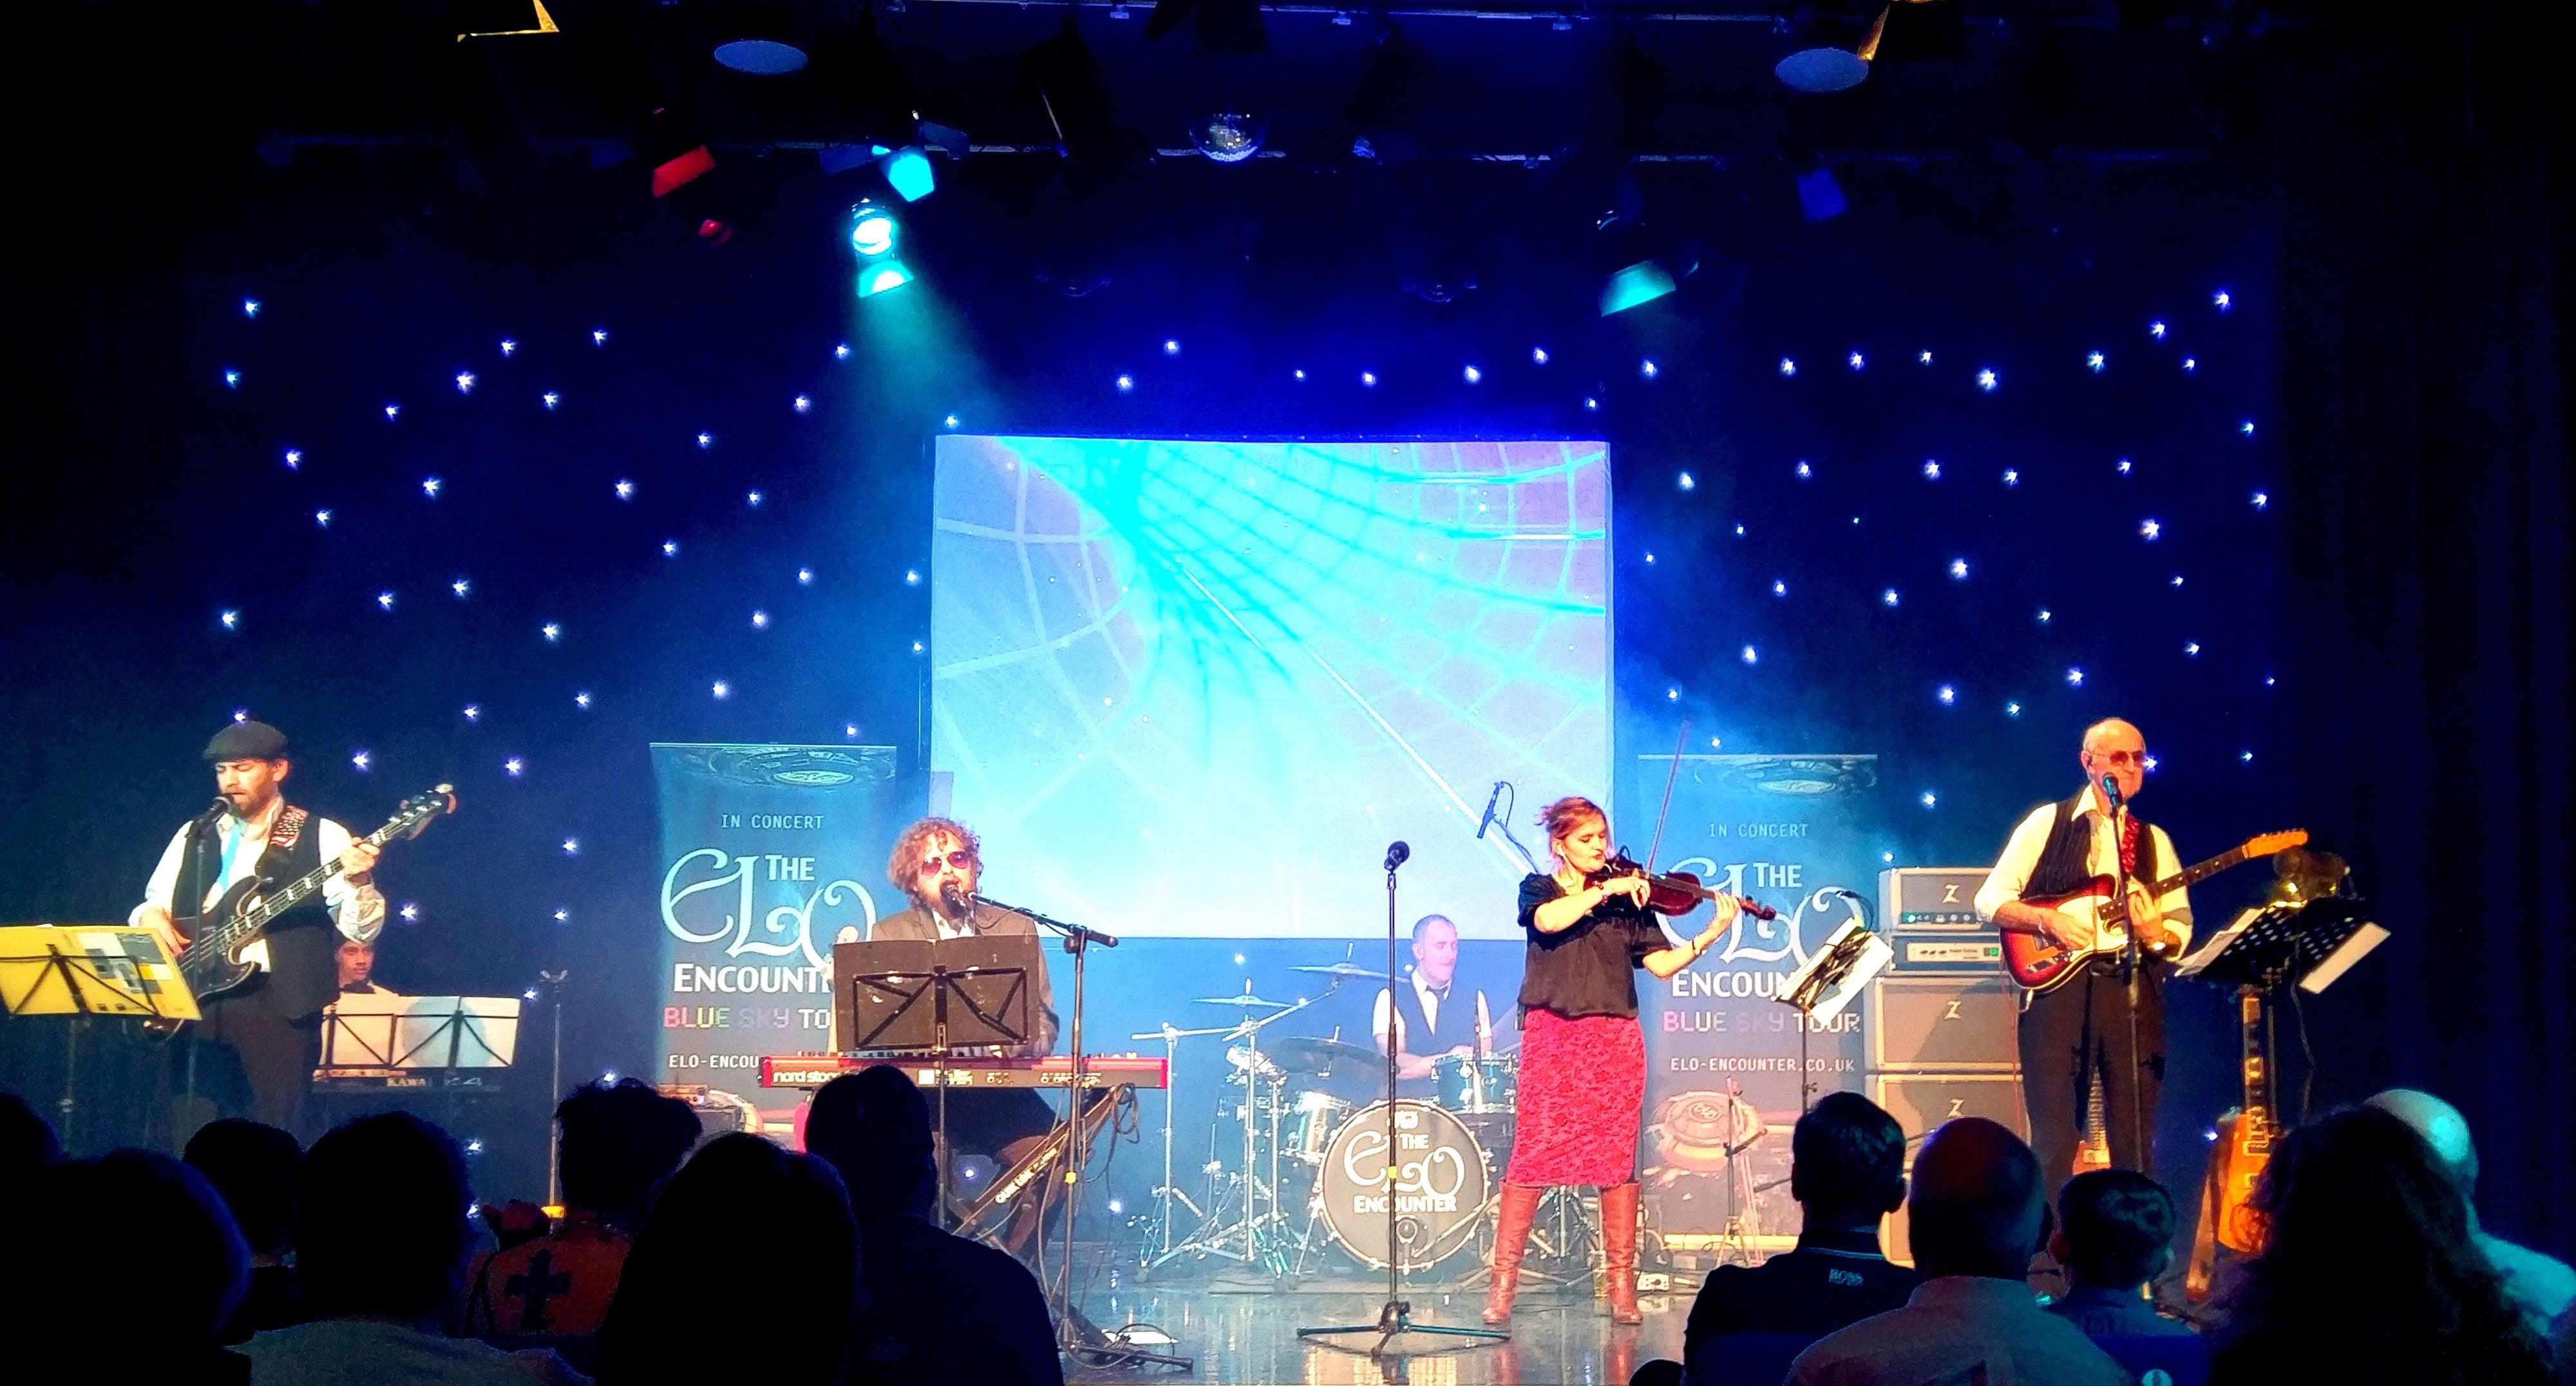 ELO Encounter Live - Braintree Arts